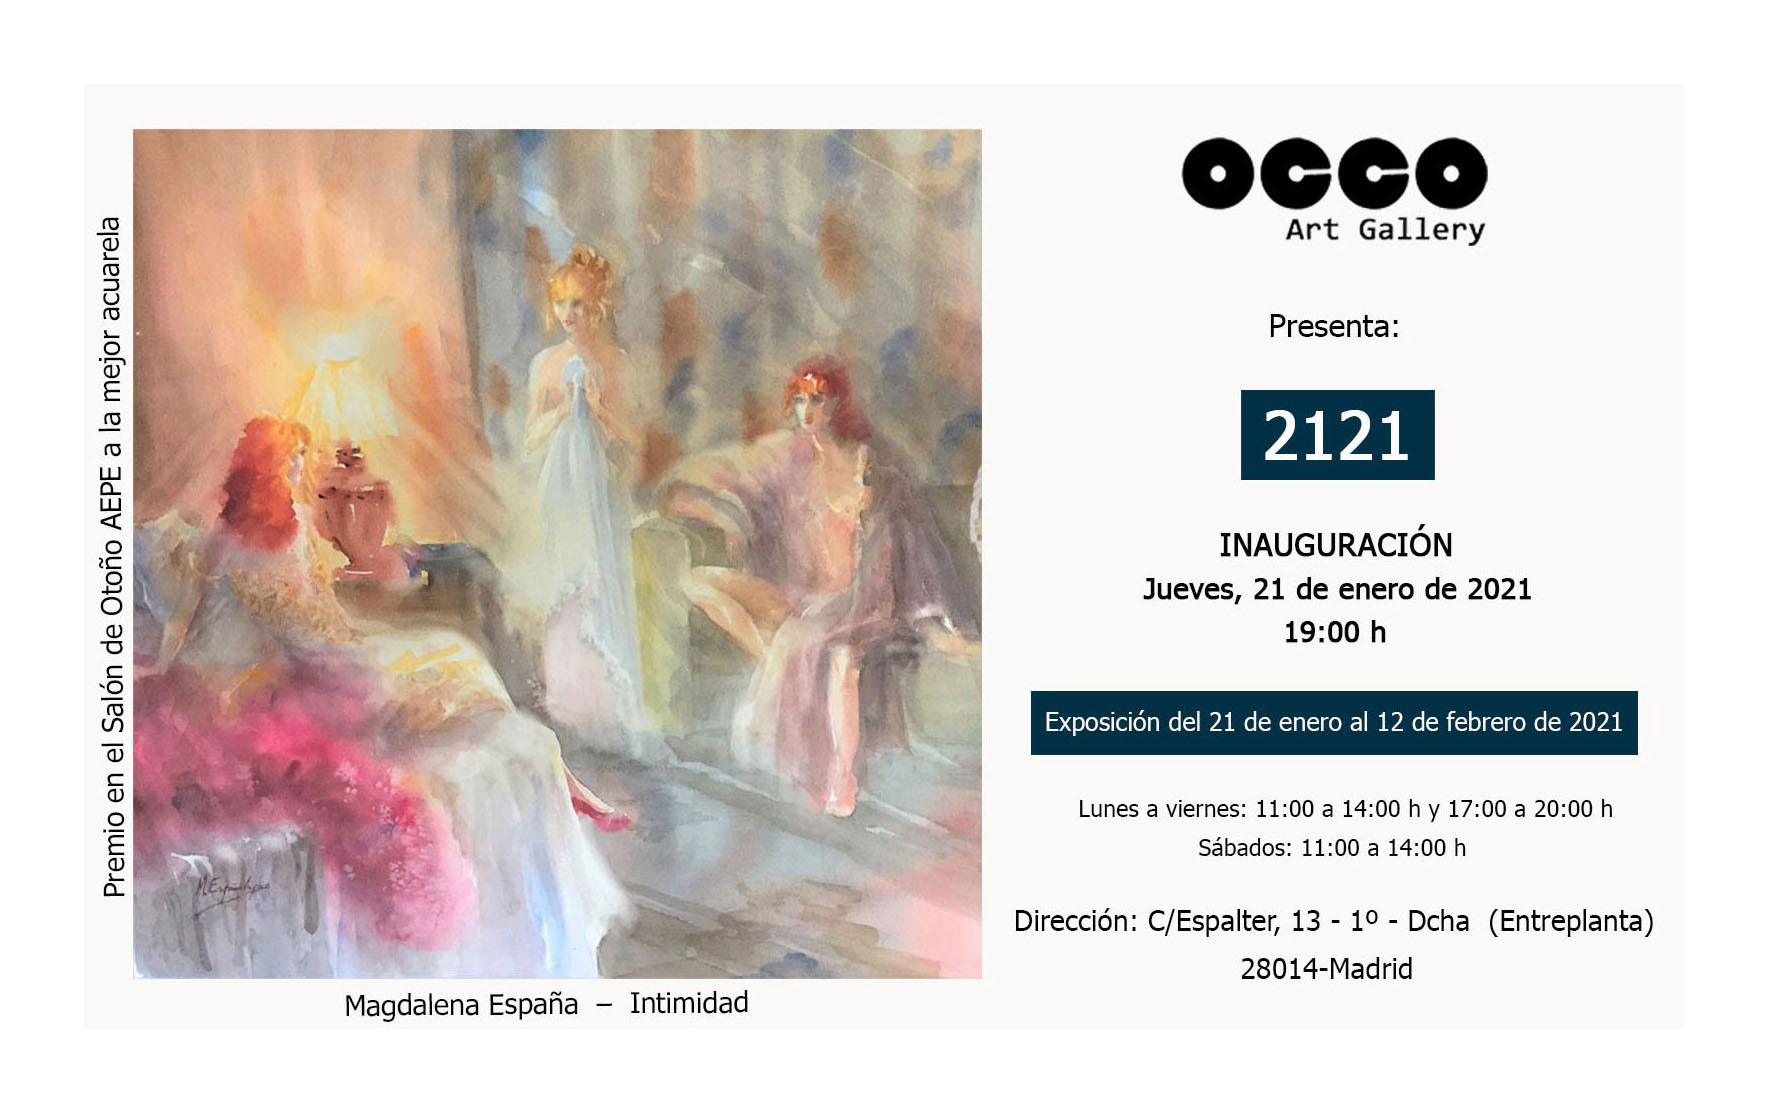 Exposición 2121 en OCCO Art Gallery